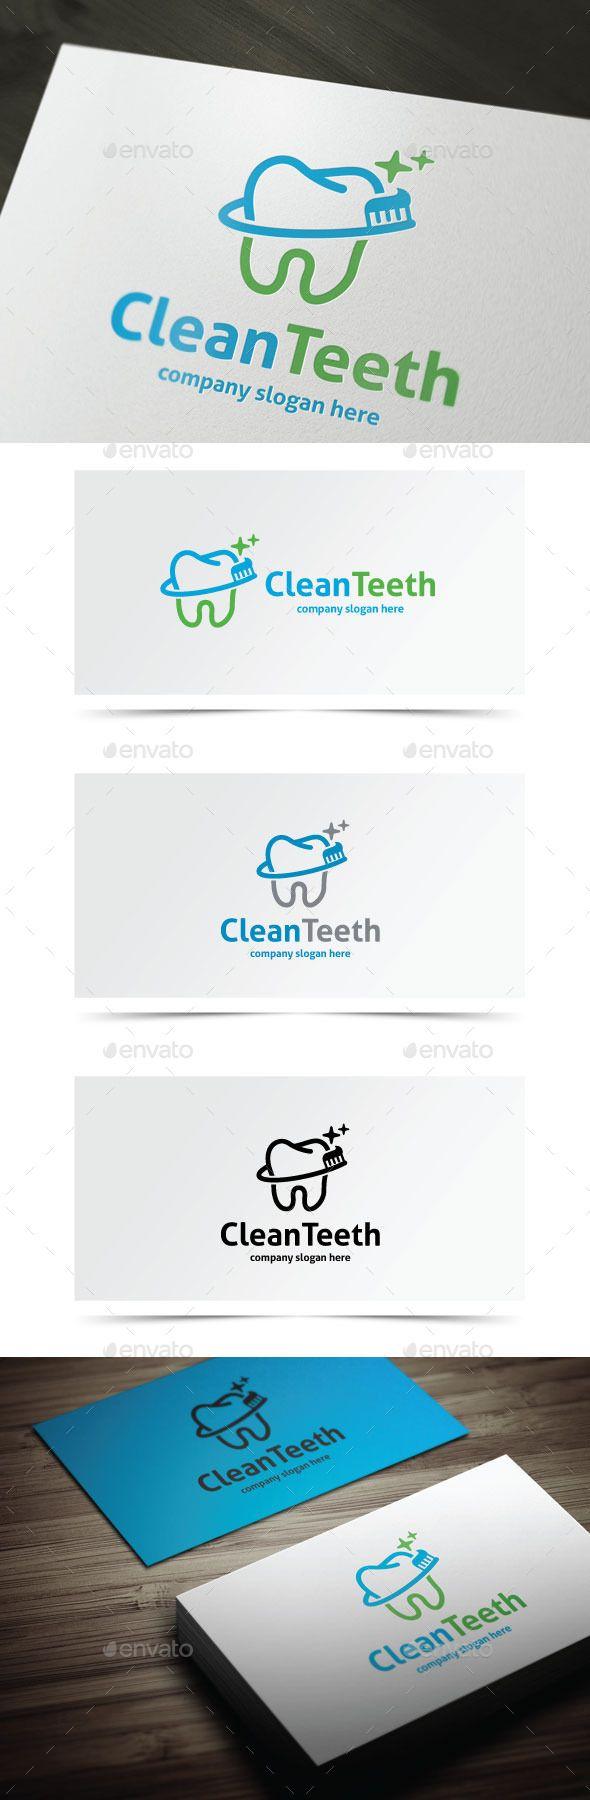 Clean Teeth - Logo Design Template Vector #logotype Download it here: http://graphicriver.net/item/clean-teeth/9777248?s_rank=690?ref=nexion